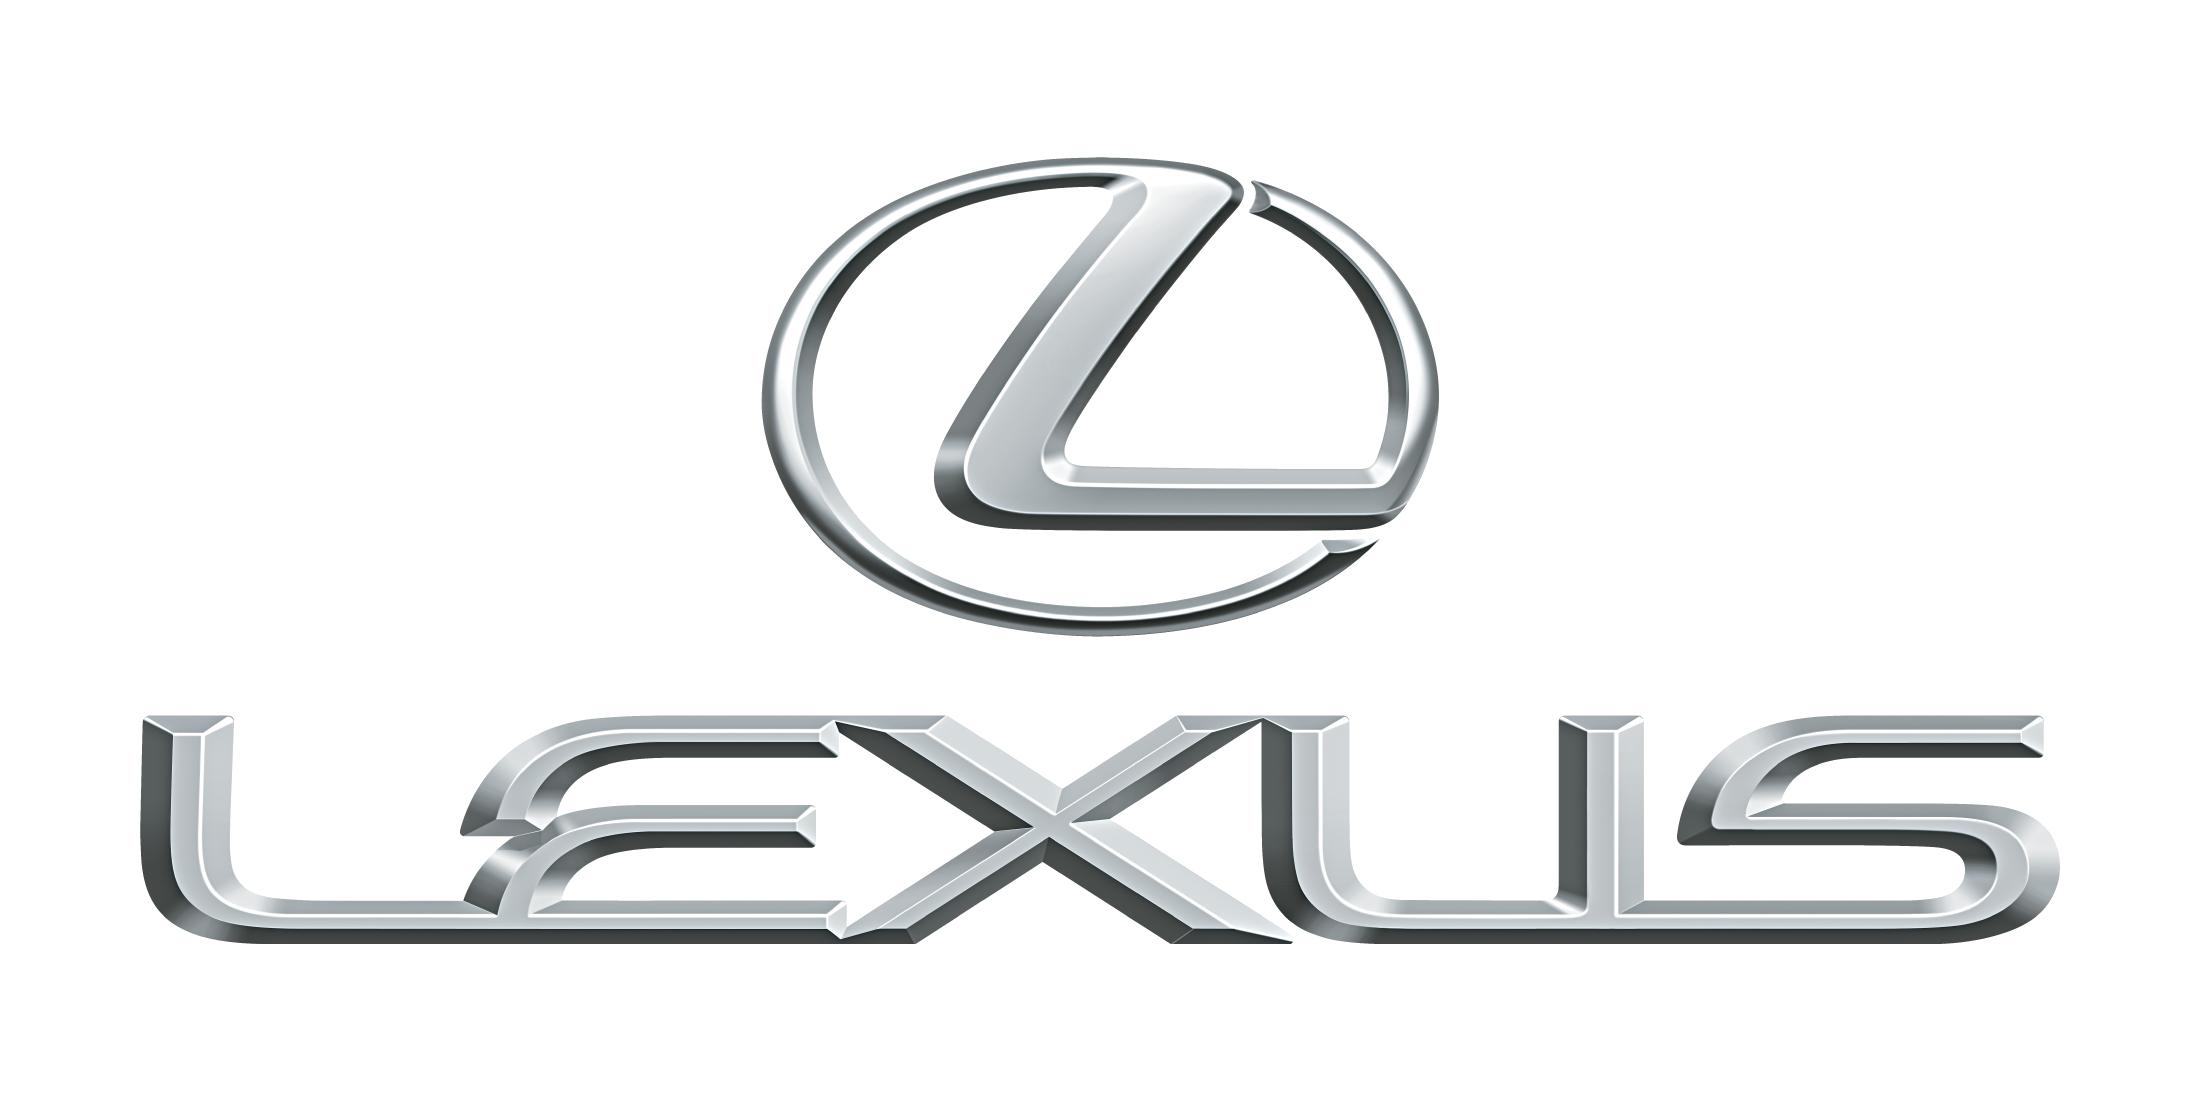 Lexus Logo Vector Transparent Background Download   Lexus Auto Logo Vector Png - Lexus Auto Vector, Transparent background PNG HD thumbnail